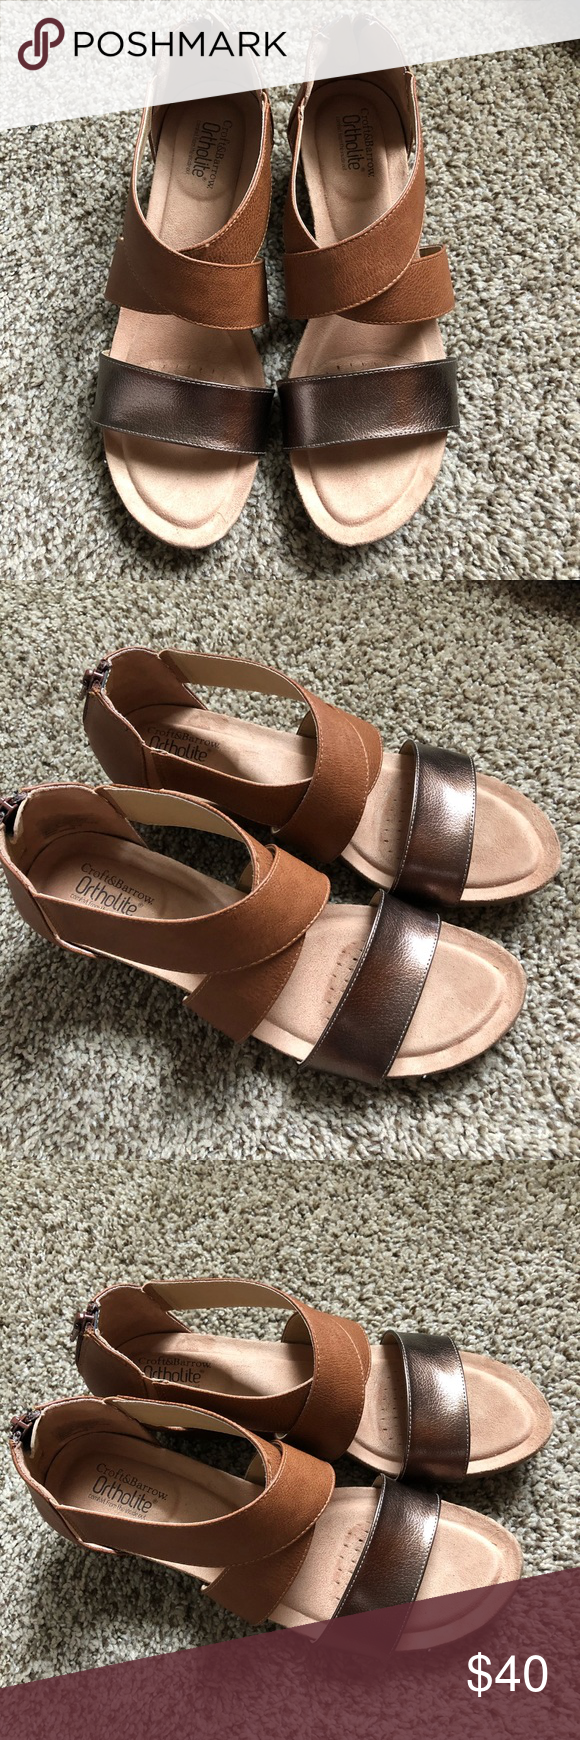 croft and barrow ortholite womens sandals